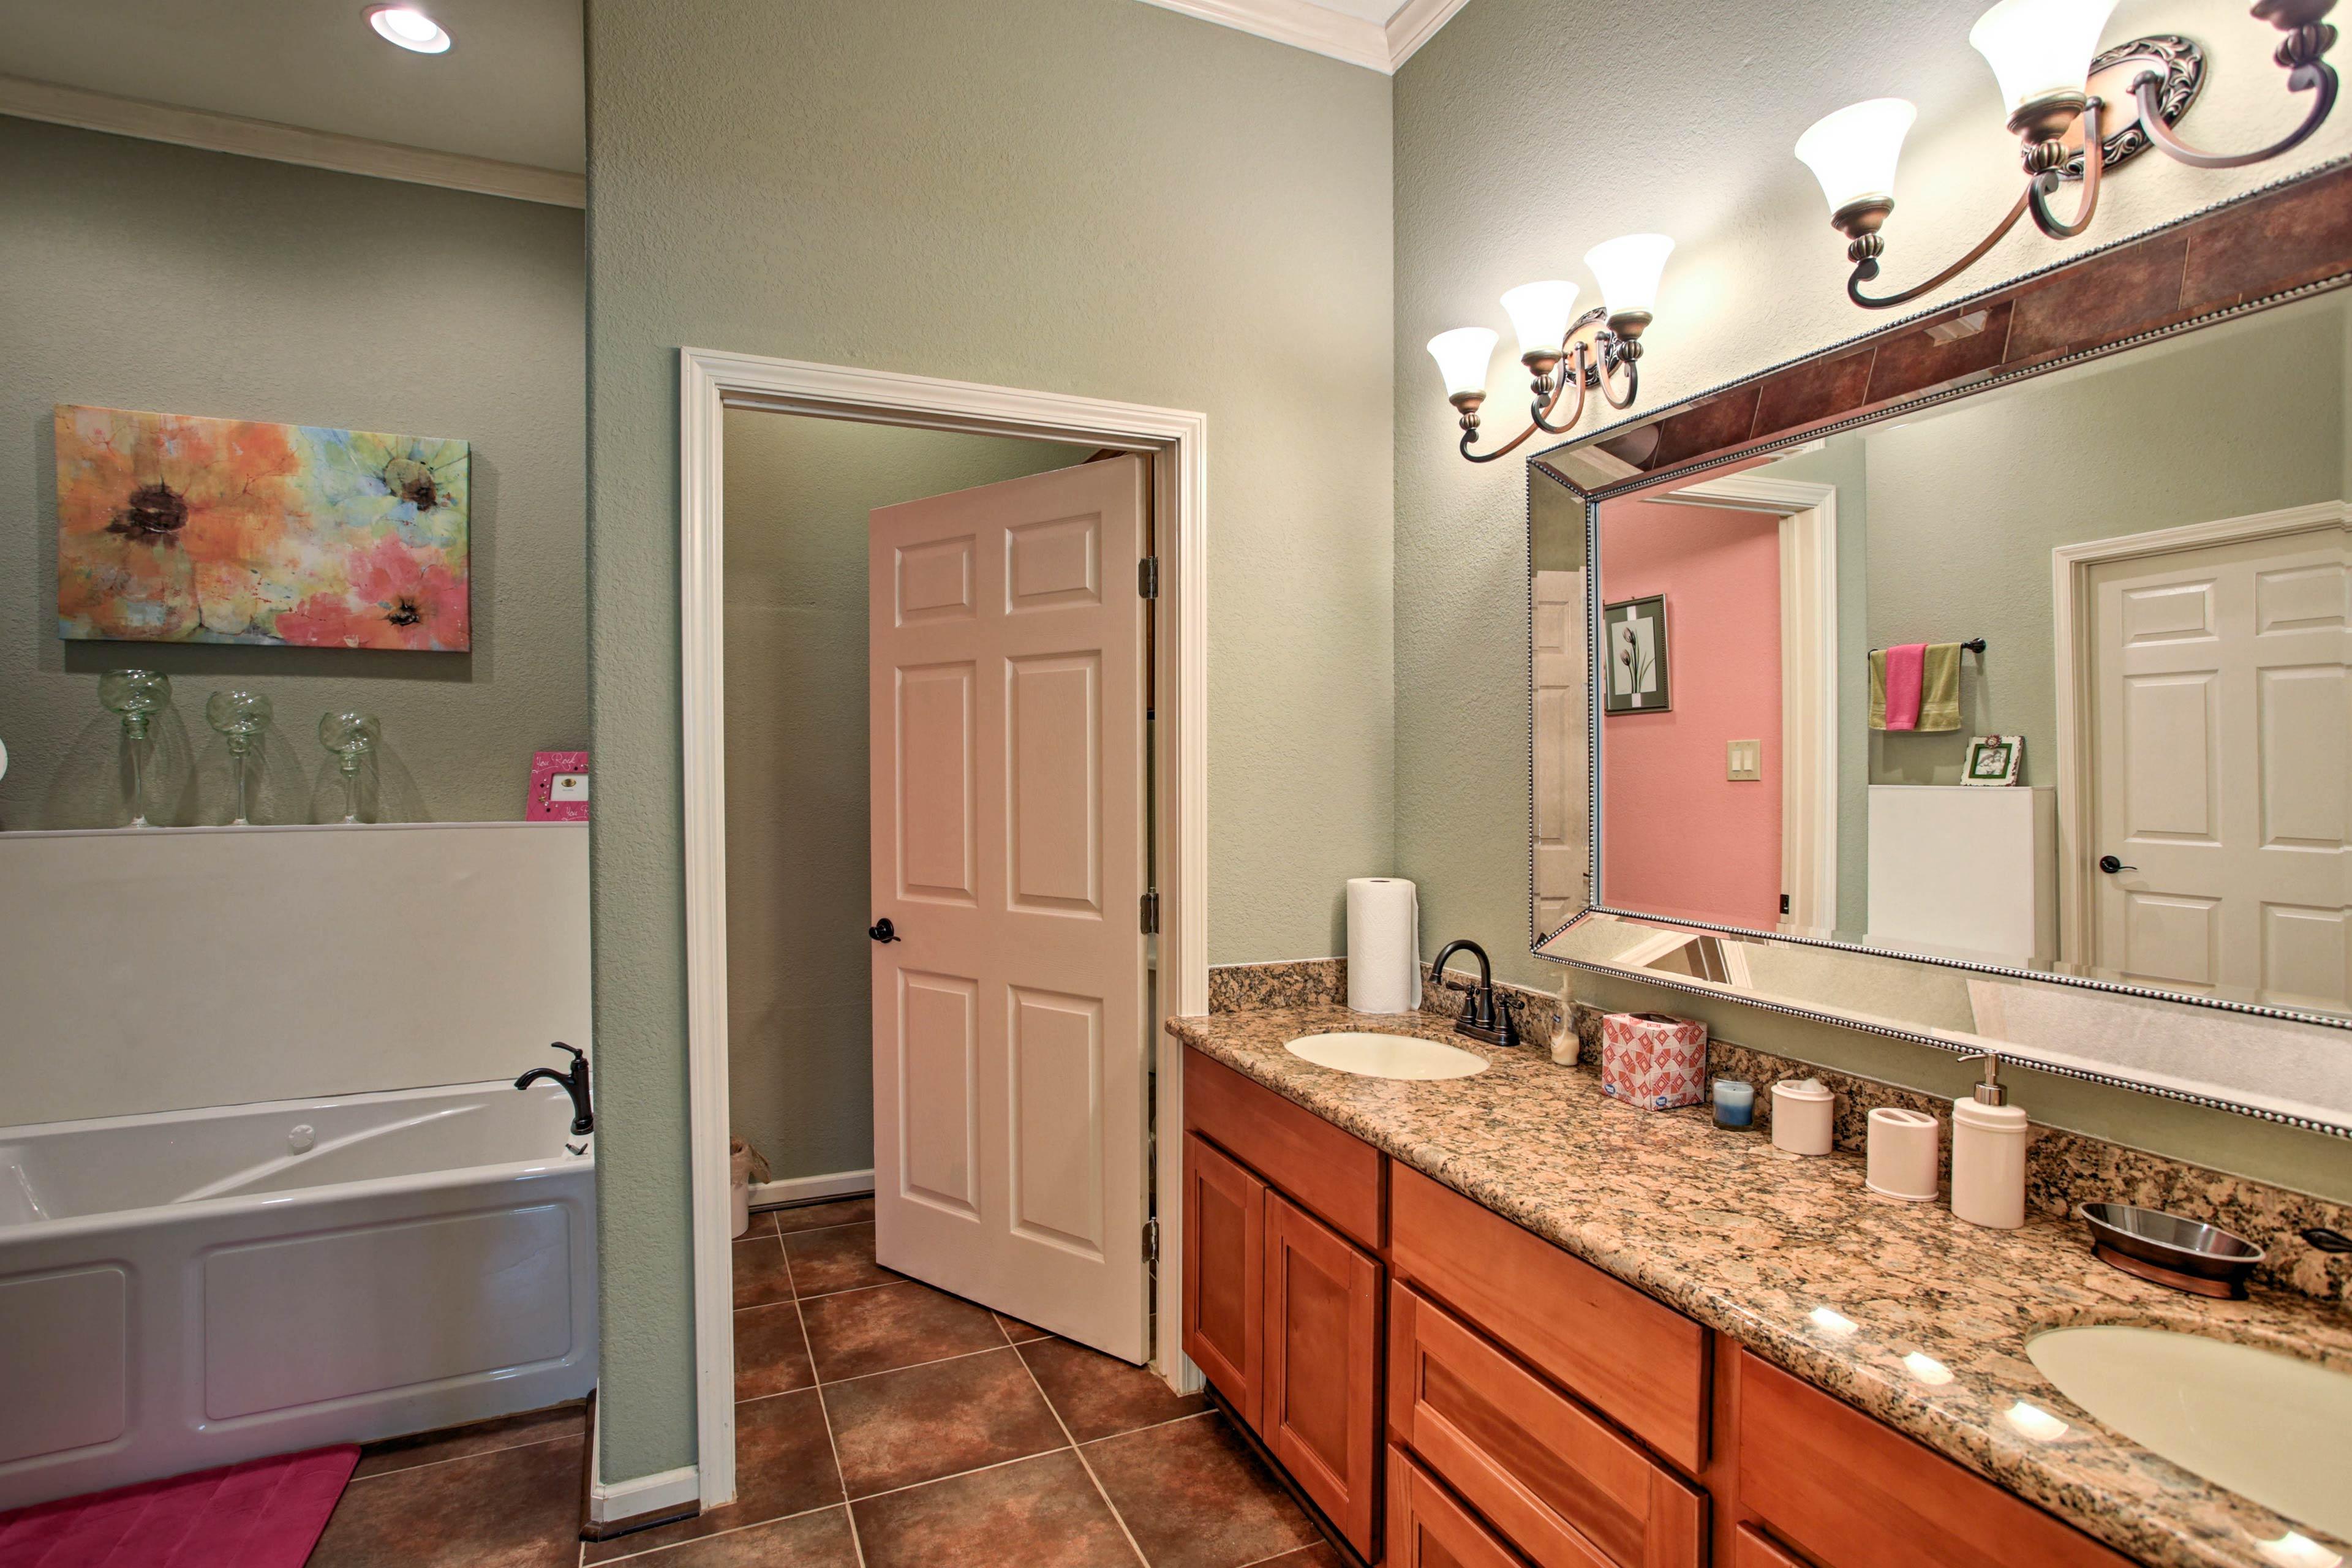 It features an en-suite bathroom, with a Jacuzzi tub.